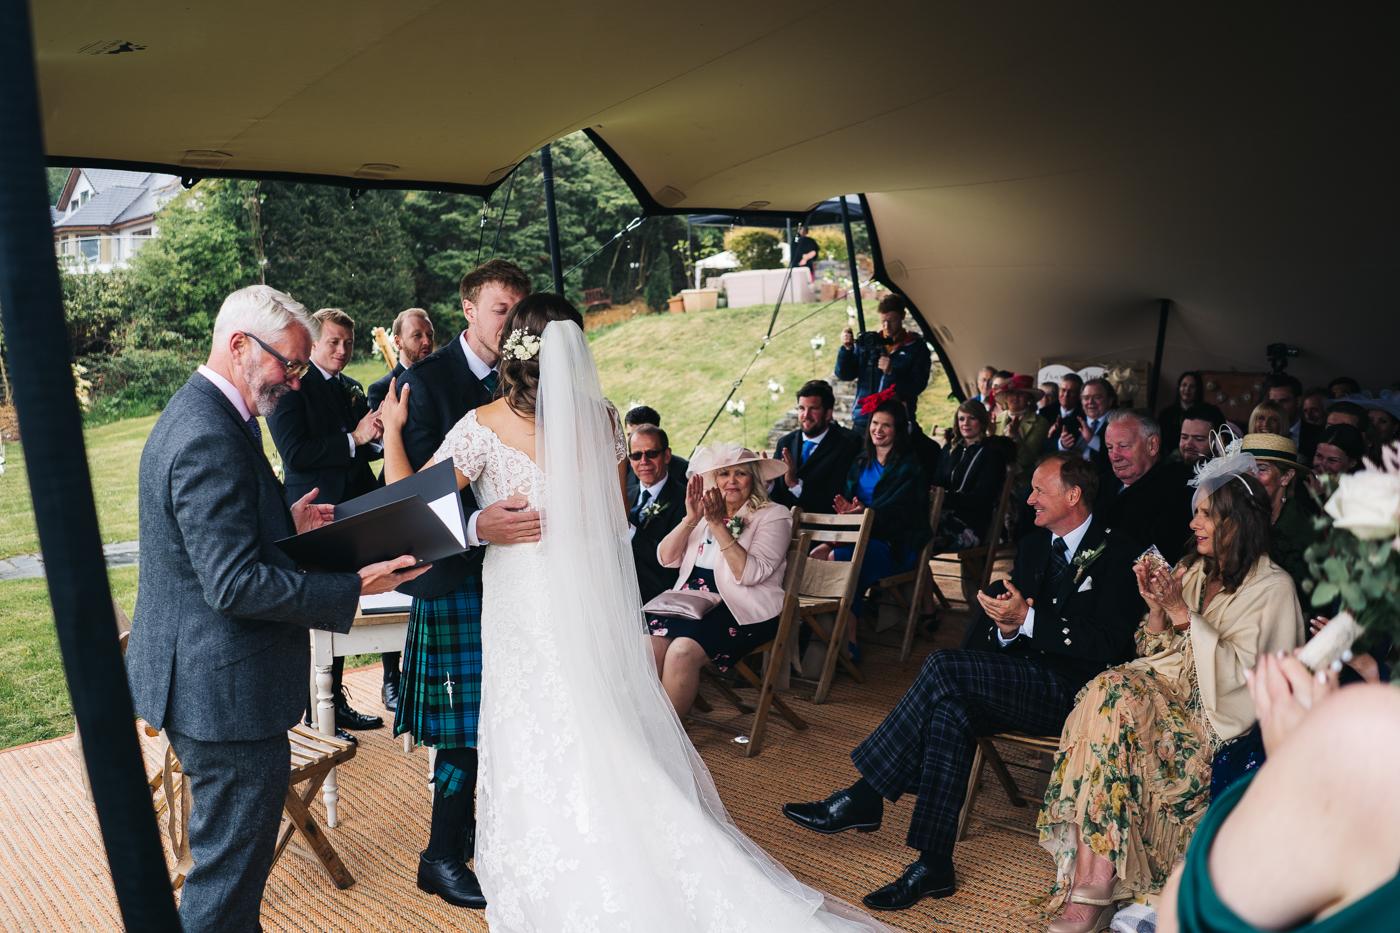 scottish-wedding-trossachs-loch-tay-highlannds-relaxed-photography-photographer-0023.jpg